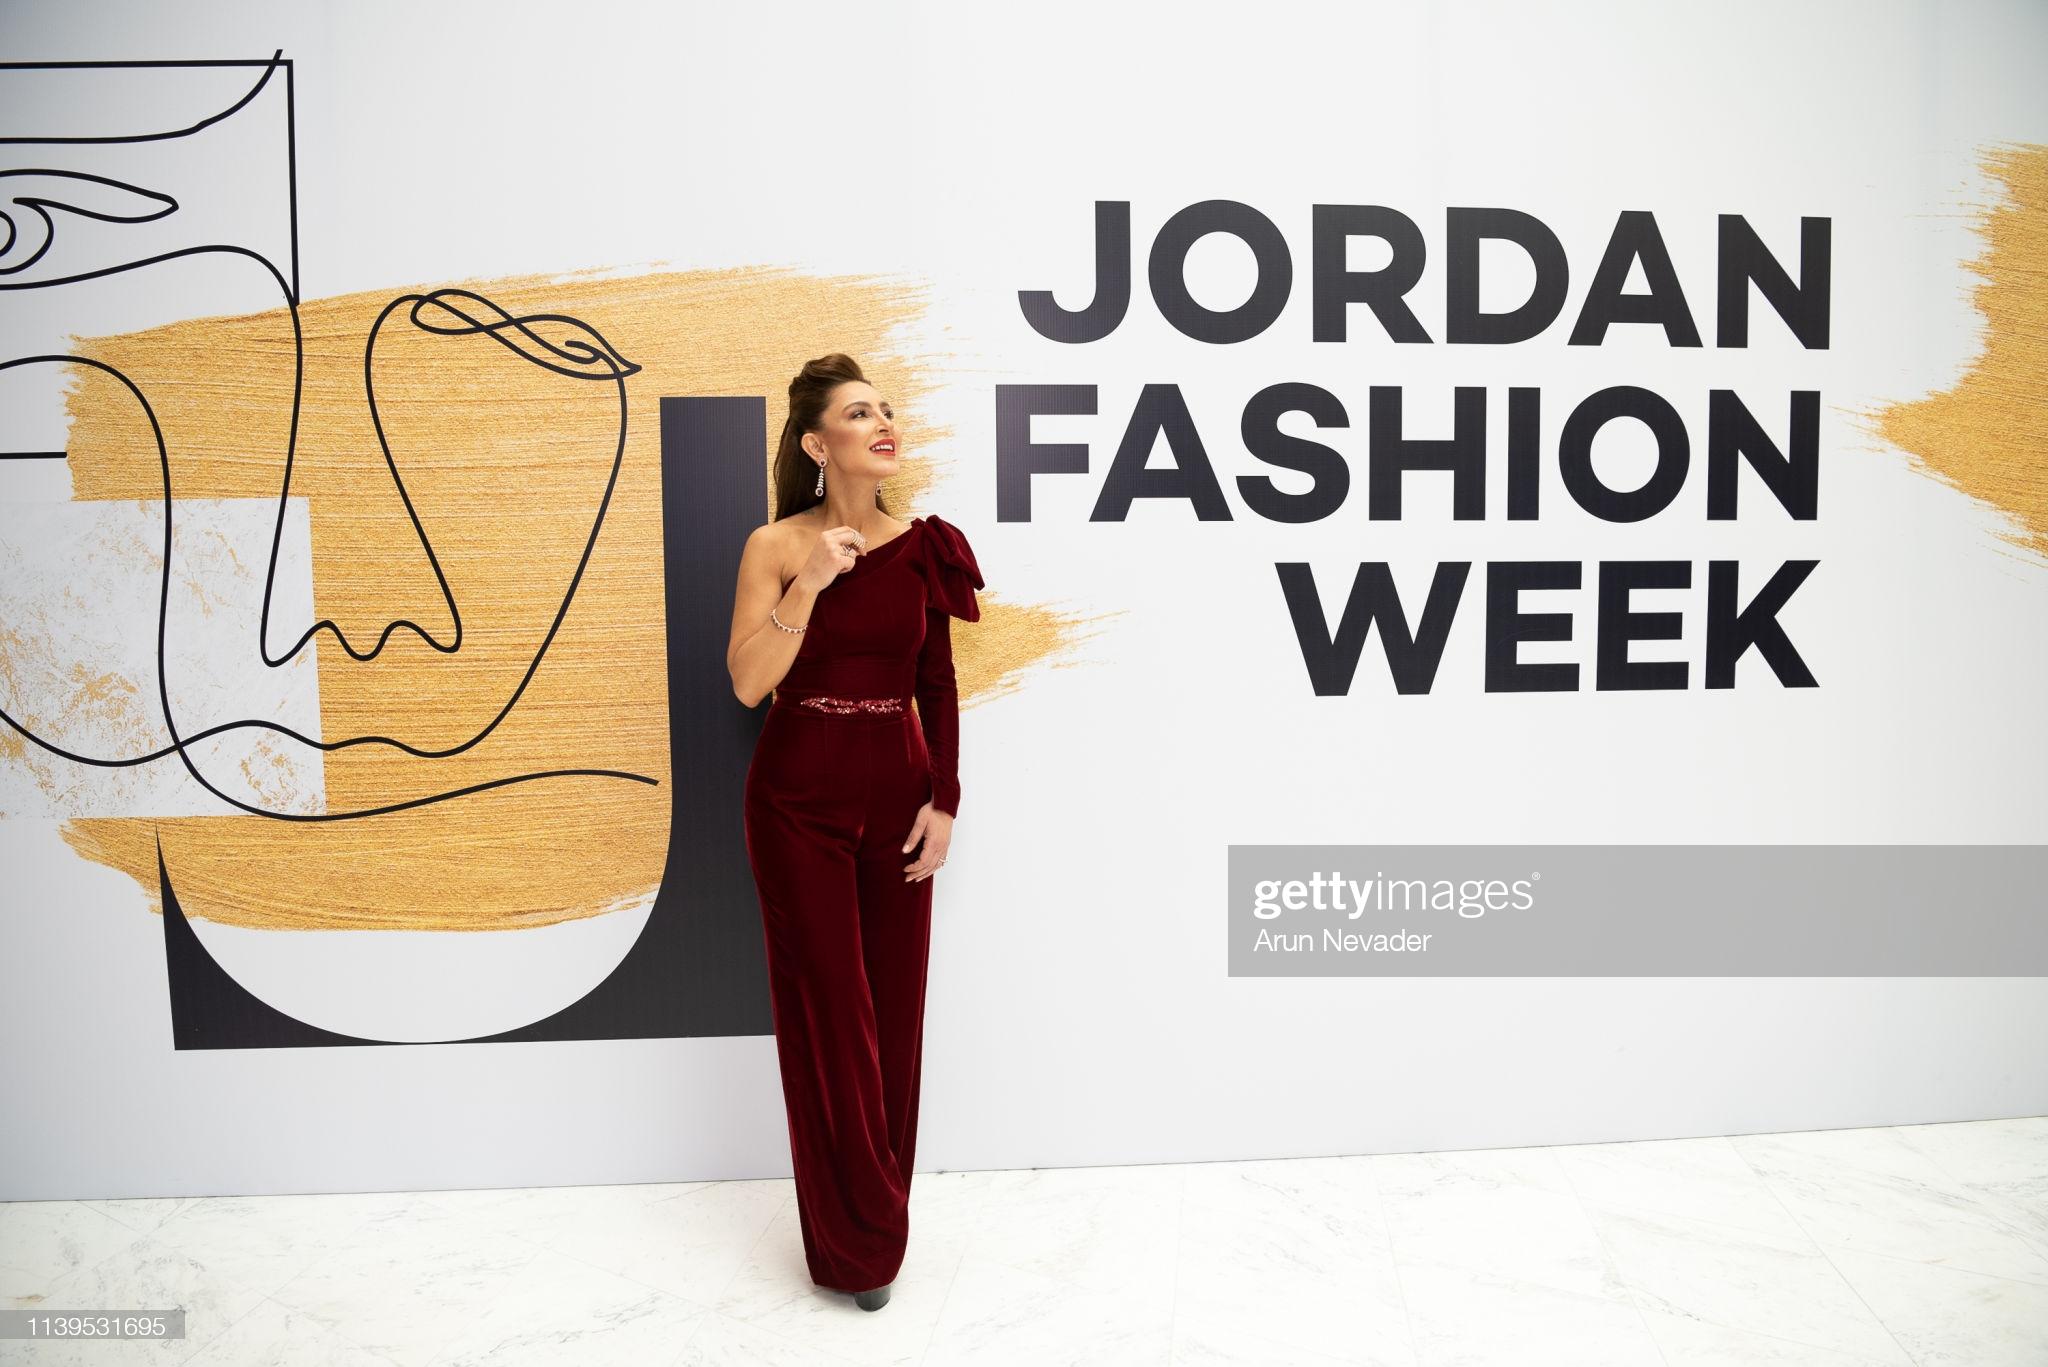 AMMAN, JORDAN - MARCH 30, 2019: Founder of Jordan Fashion Week Shirene Rifai poses for a photo during Jordan Fashion Week 019 on March 30, 2019 at the Kempinski Amman in Amman, Jordan.  (Photo by Arun Nevader/Getty Images for Jordan Fashion Week)